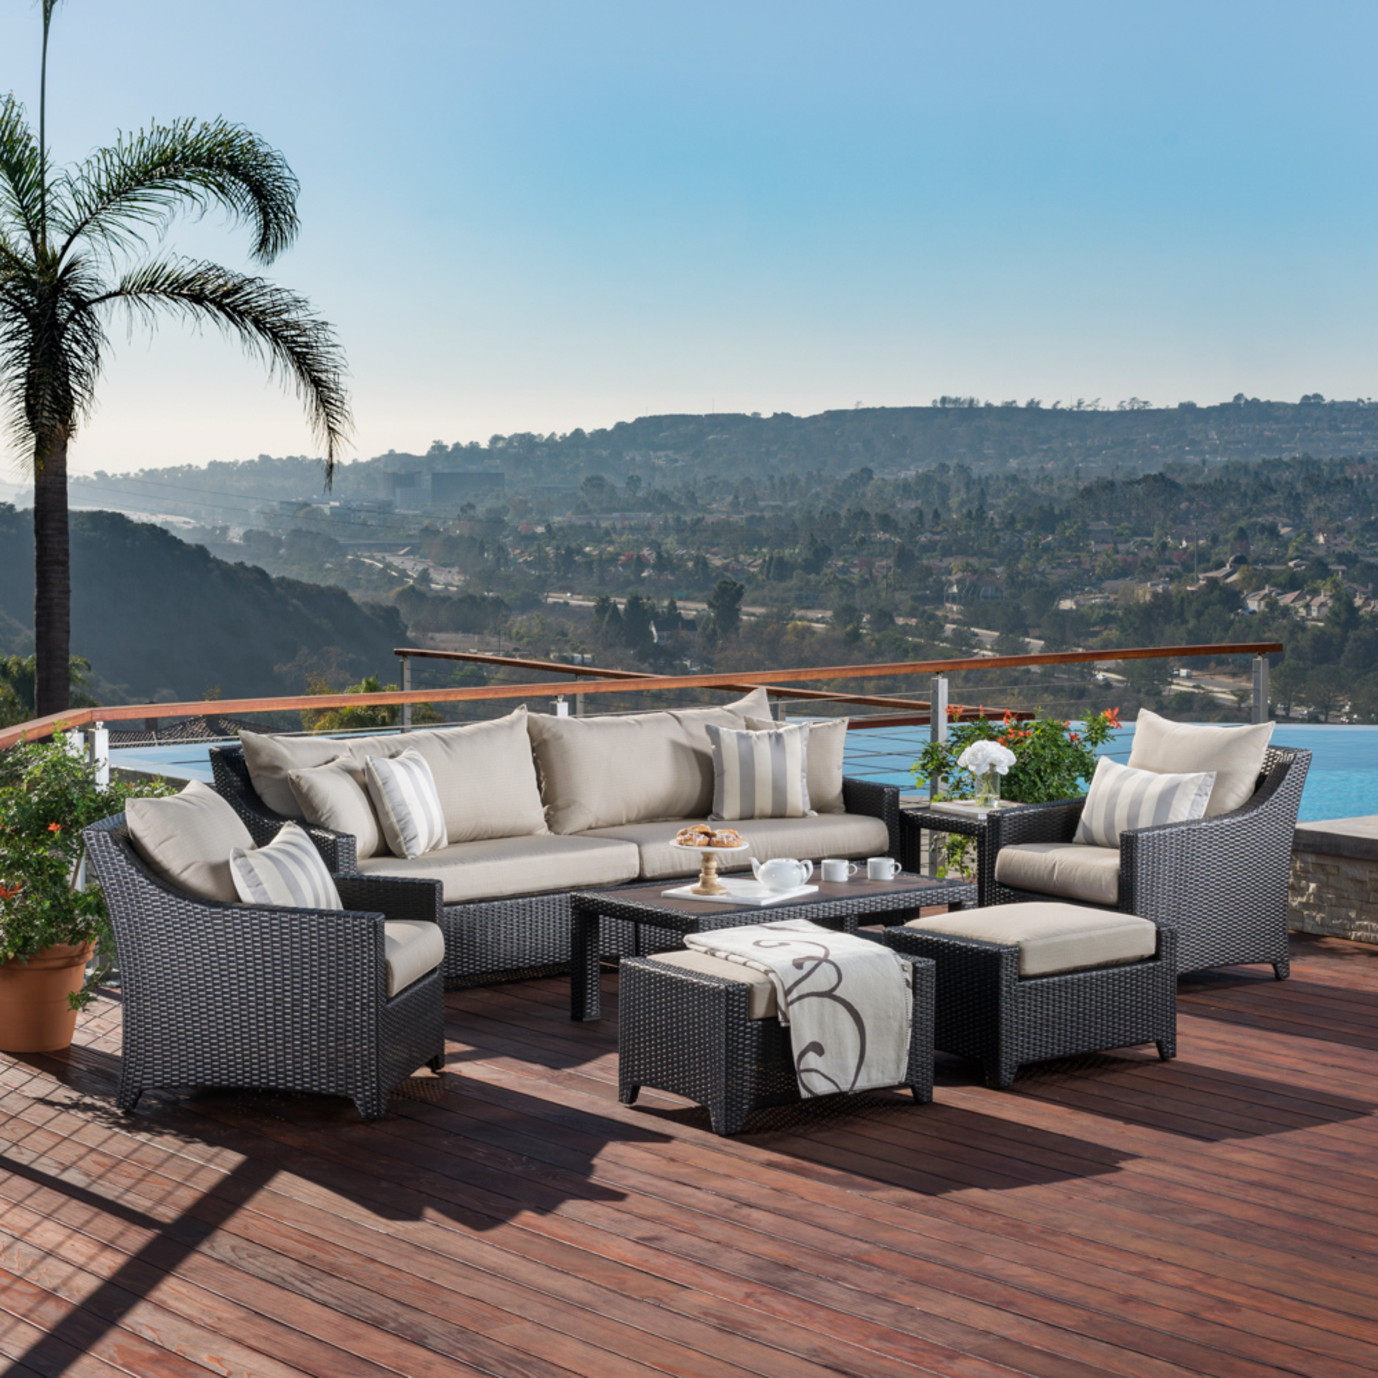 Deco™ 8pc Sofa Set with Furniture Covers - Slate Grey